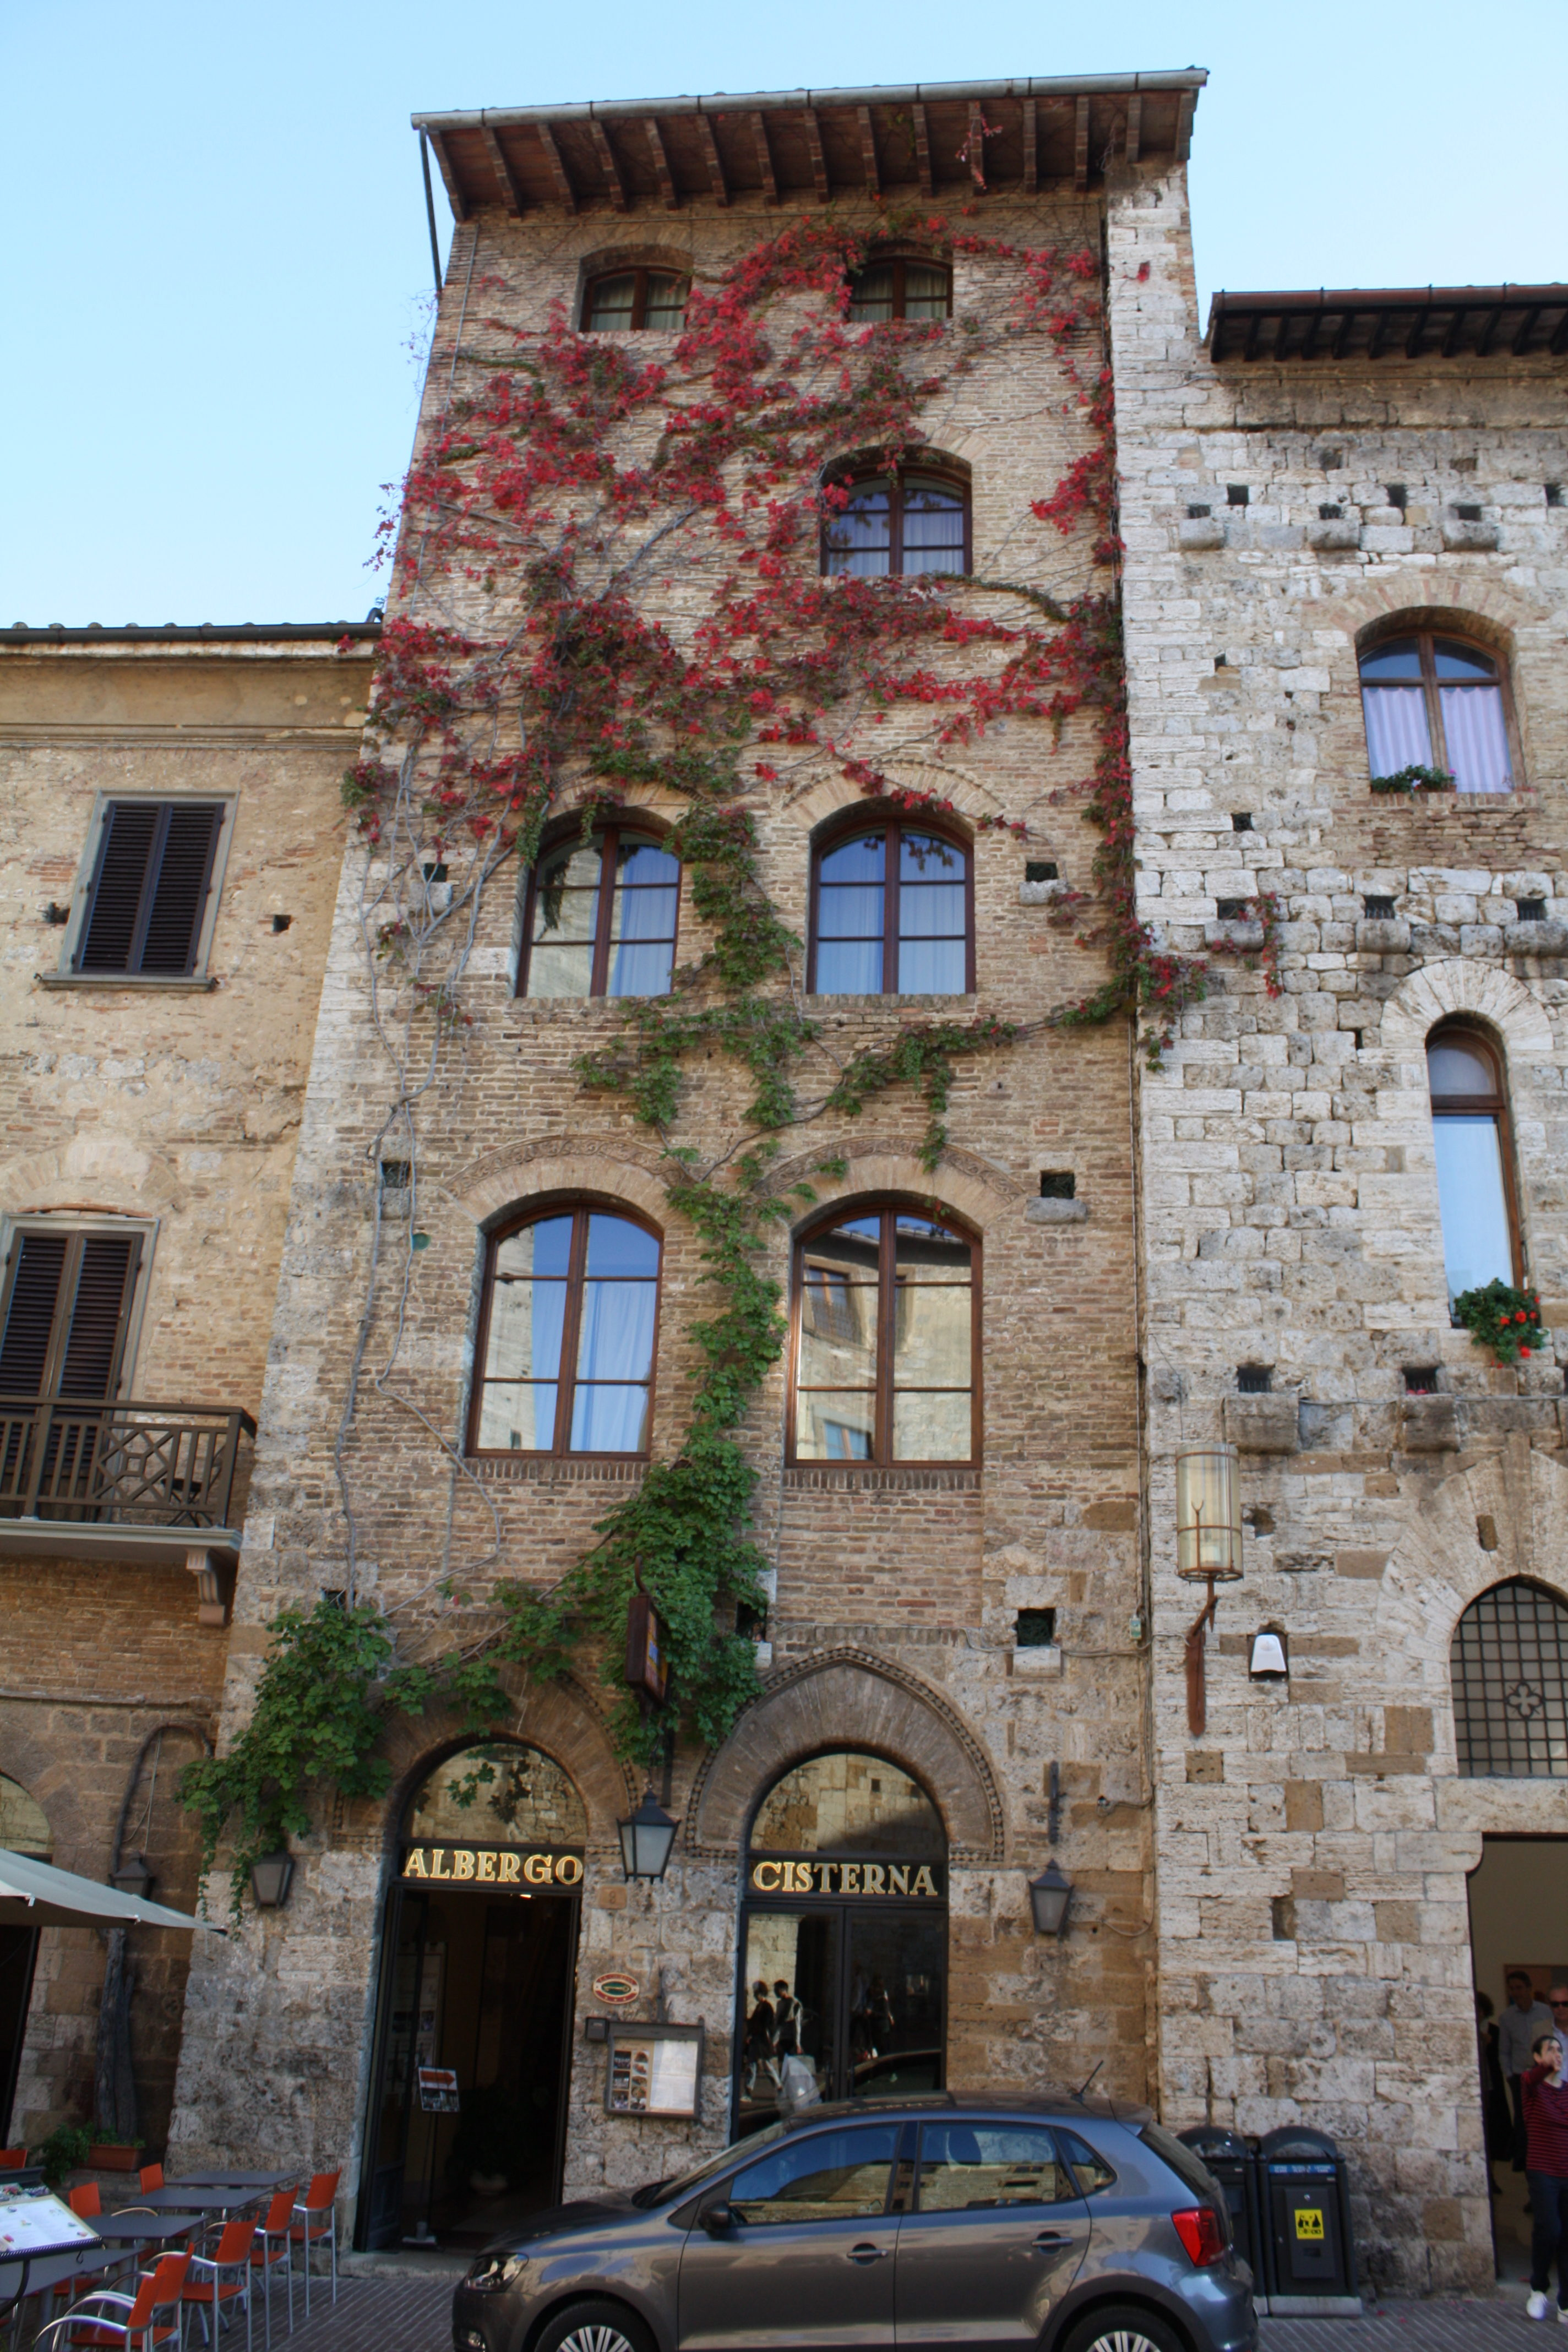 Toskania i Liguria we Włoszech